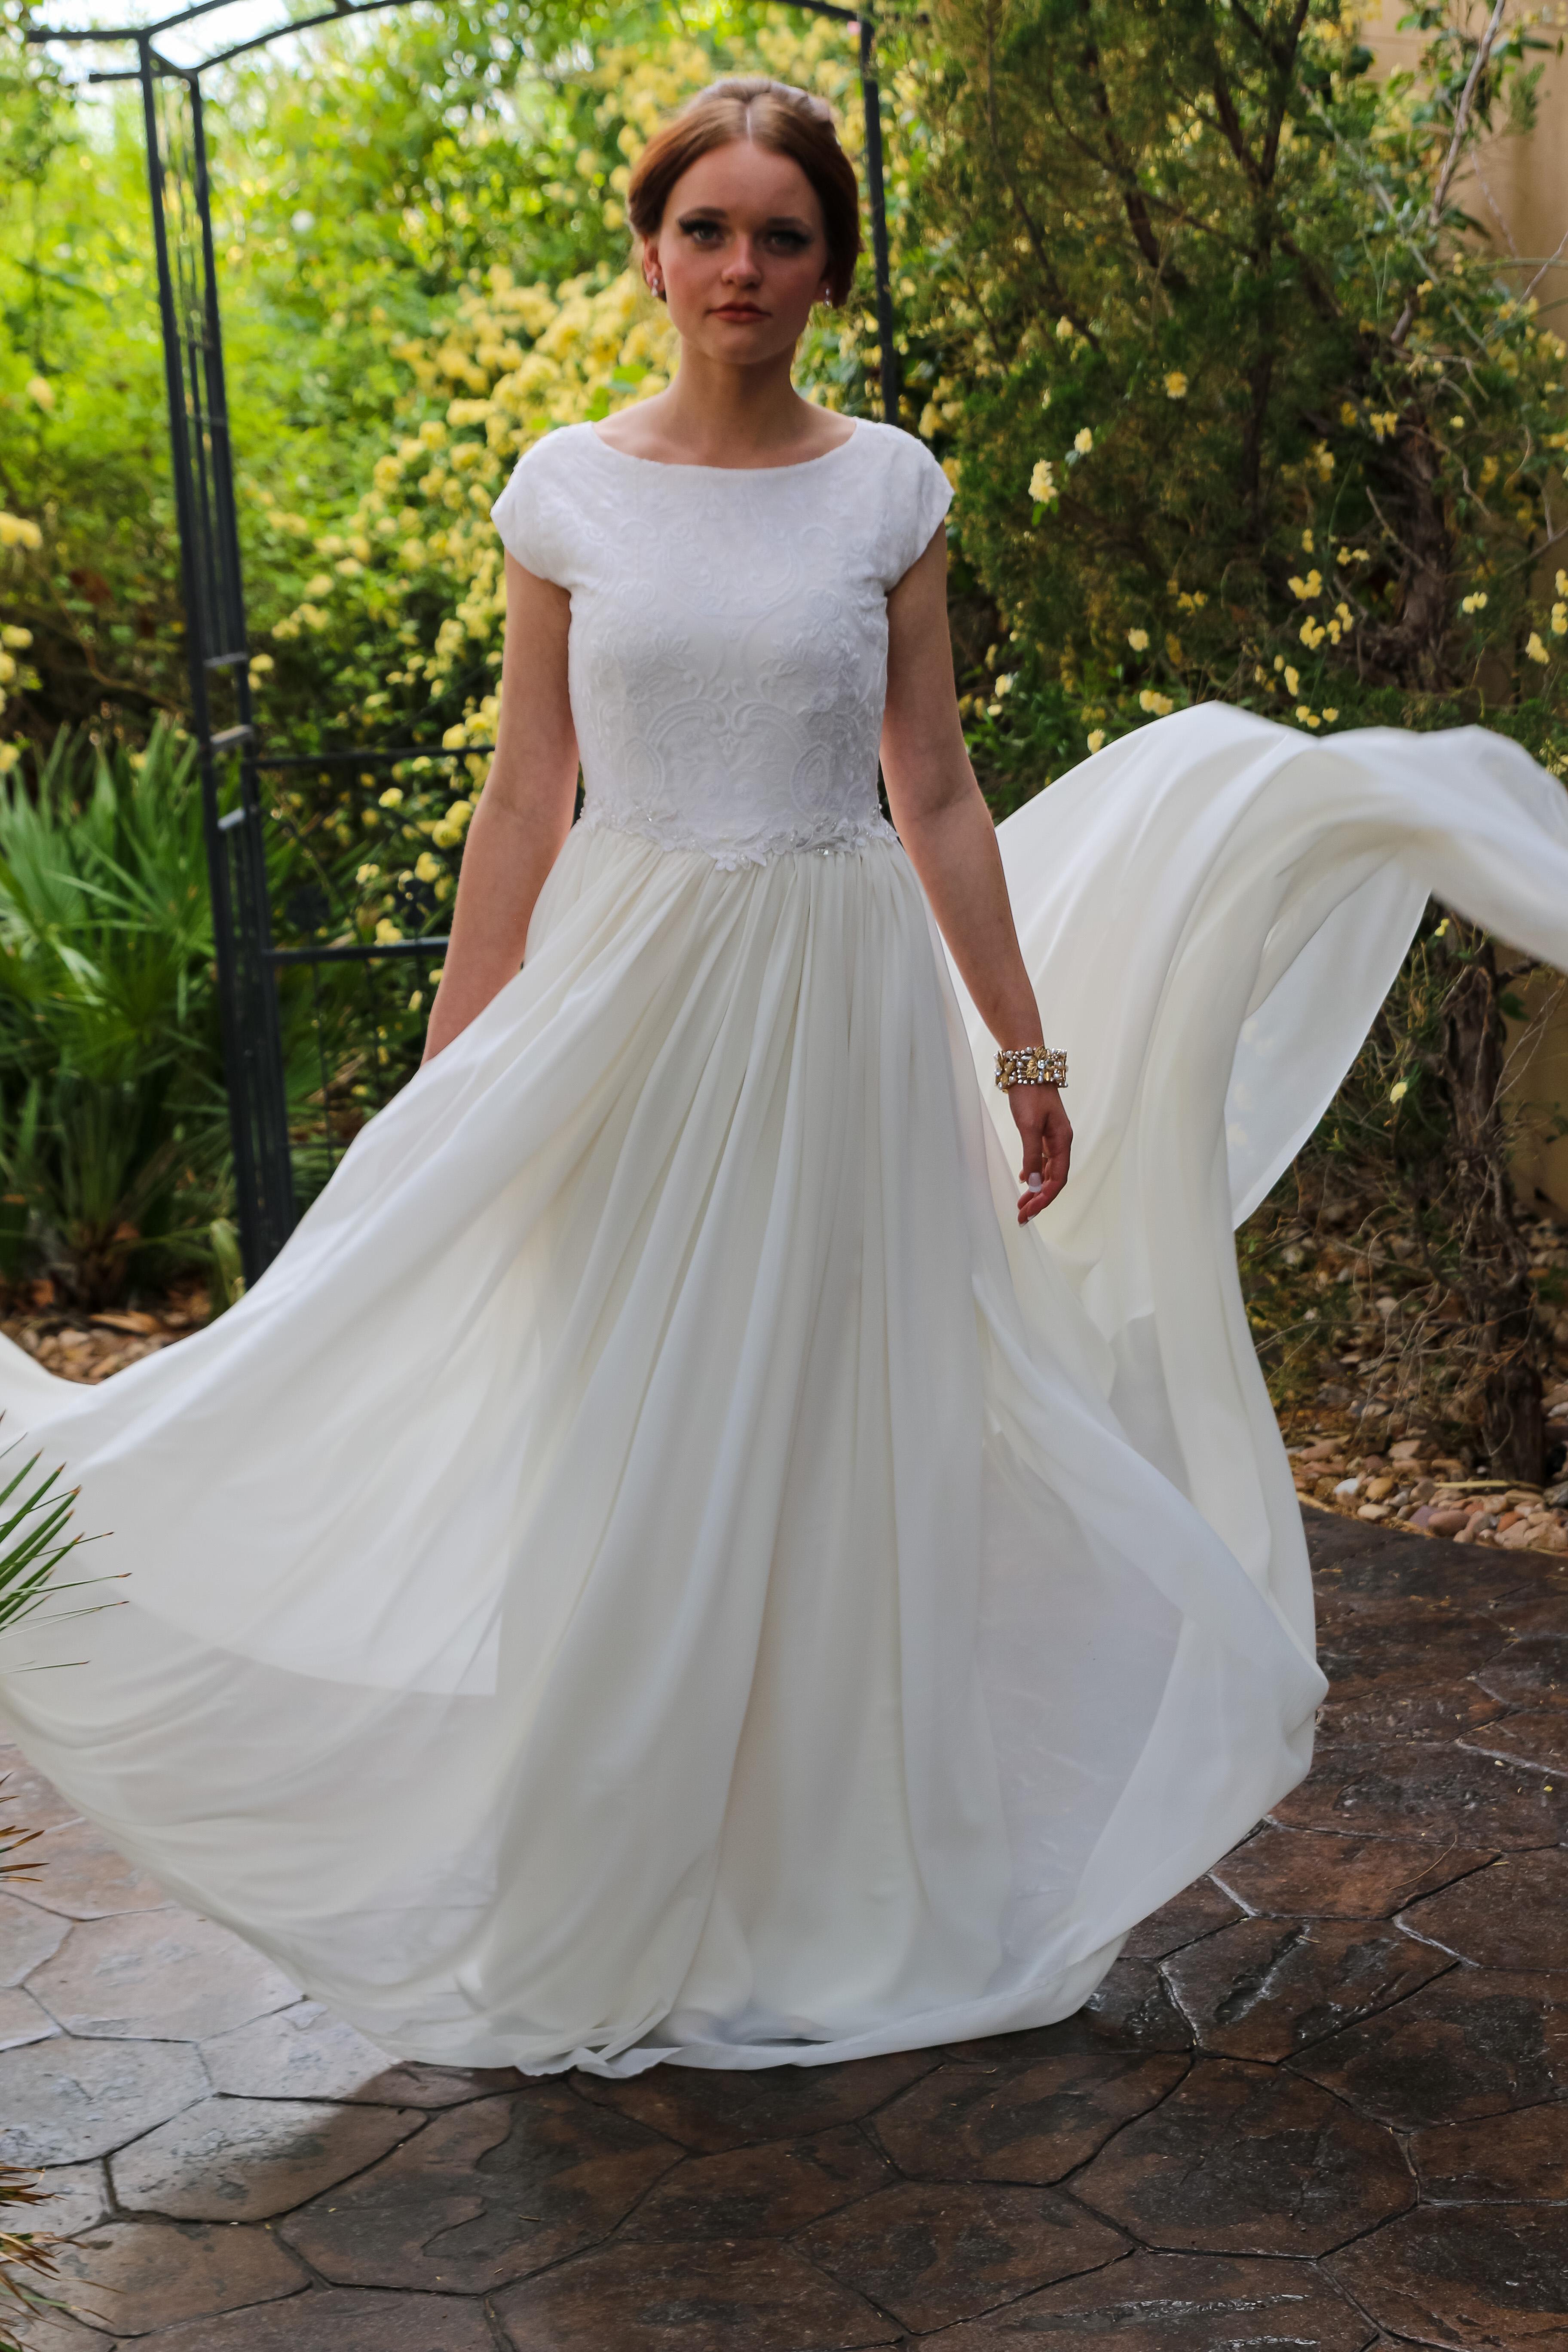 Großzügig Wedding Dress Gallery Ideen - Brautkleider Ideen ...